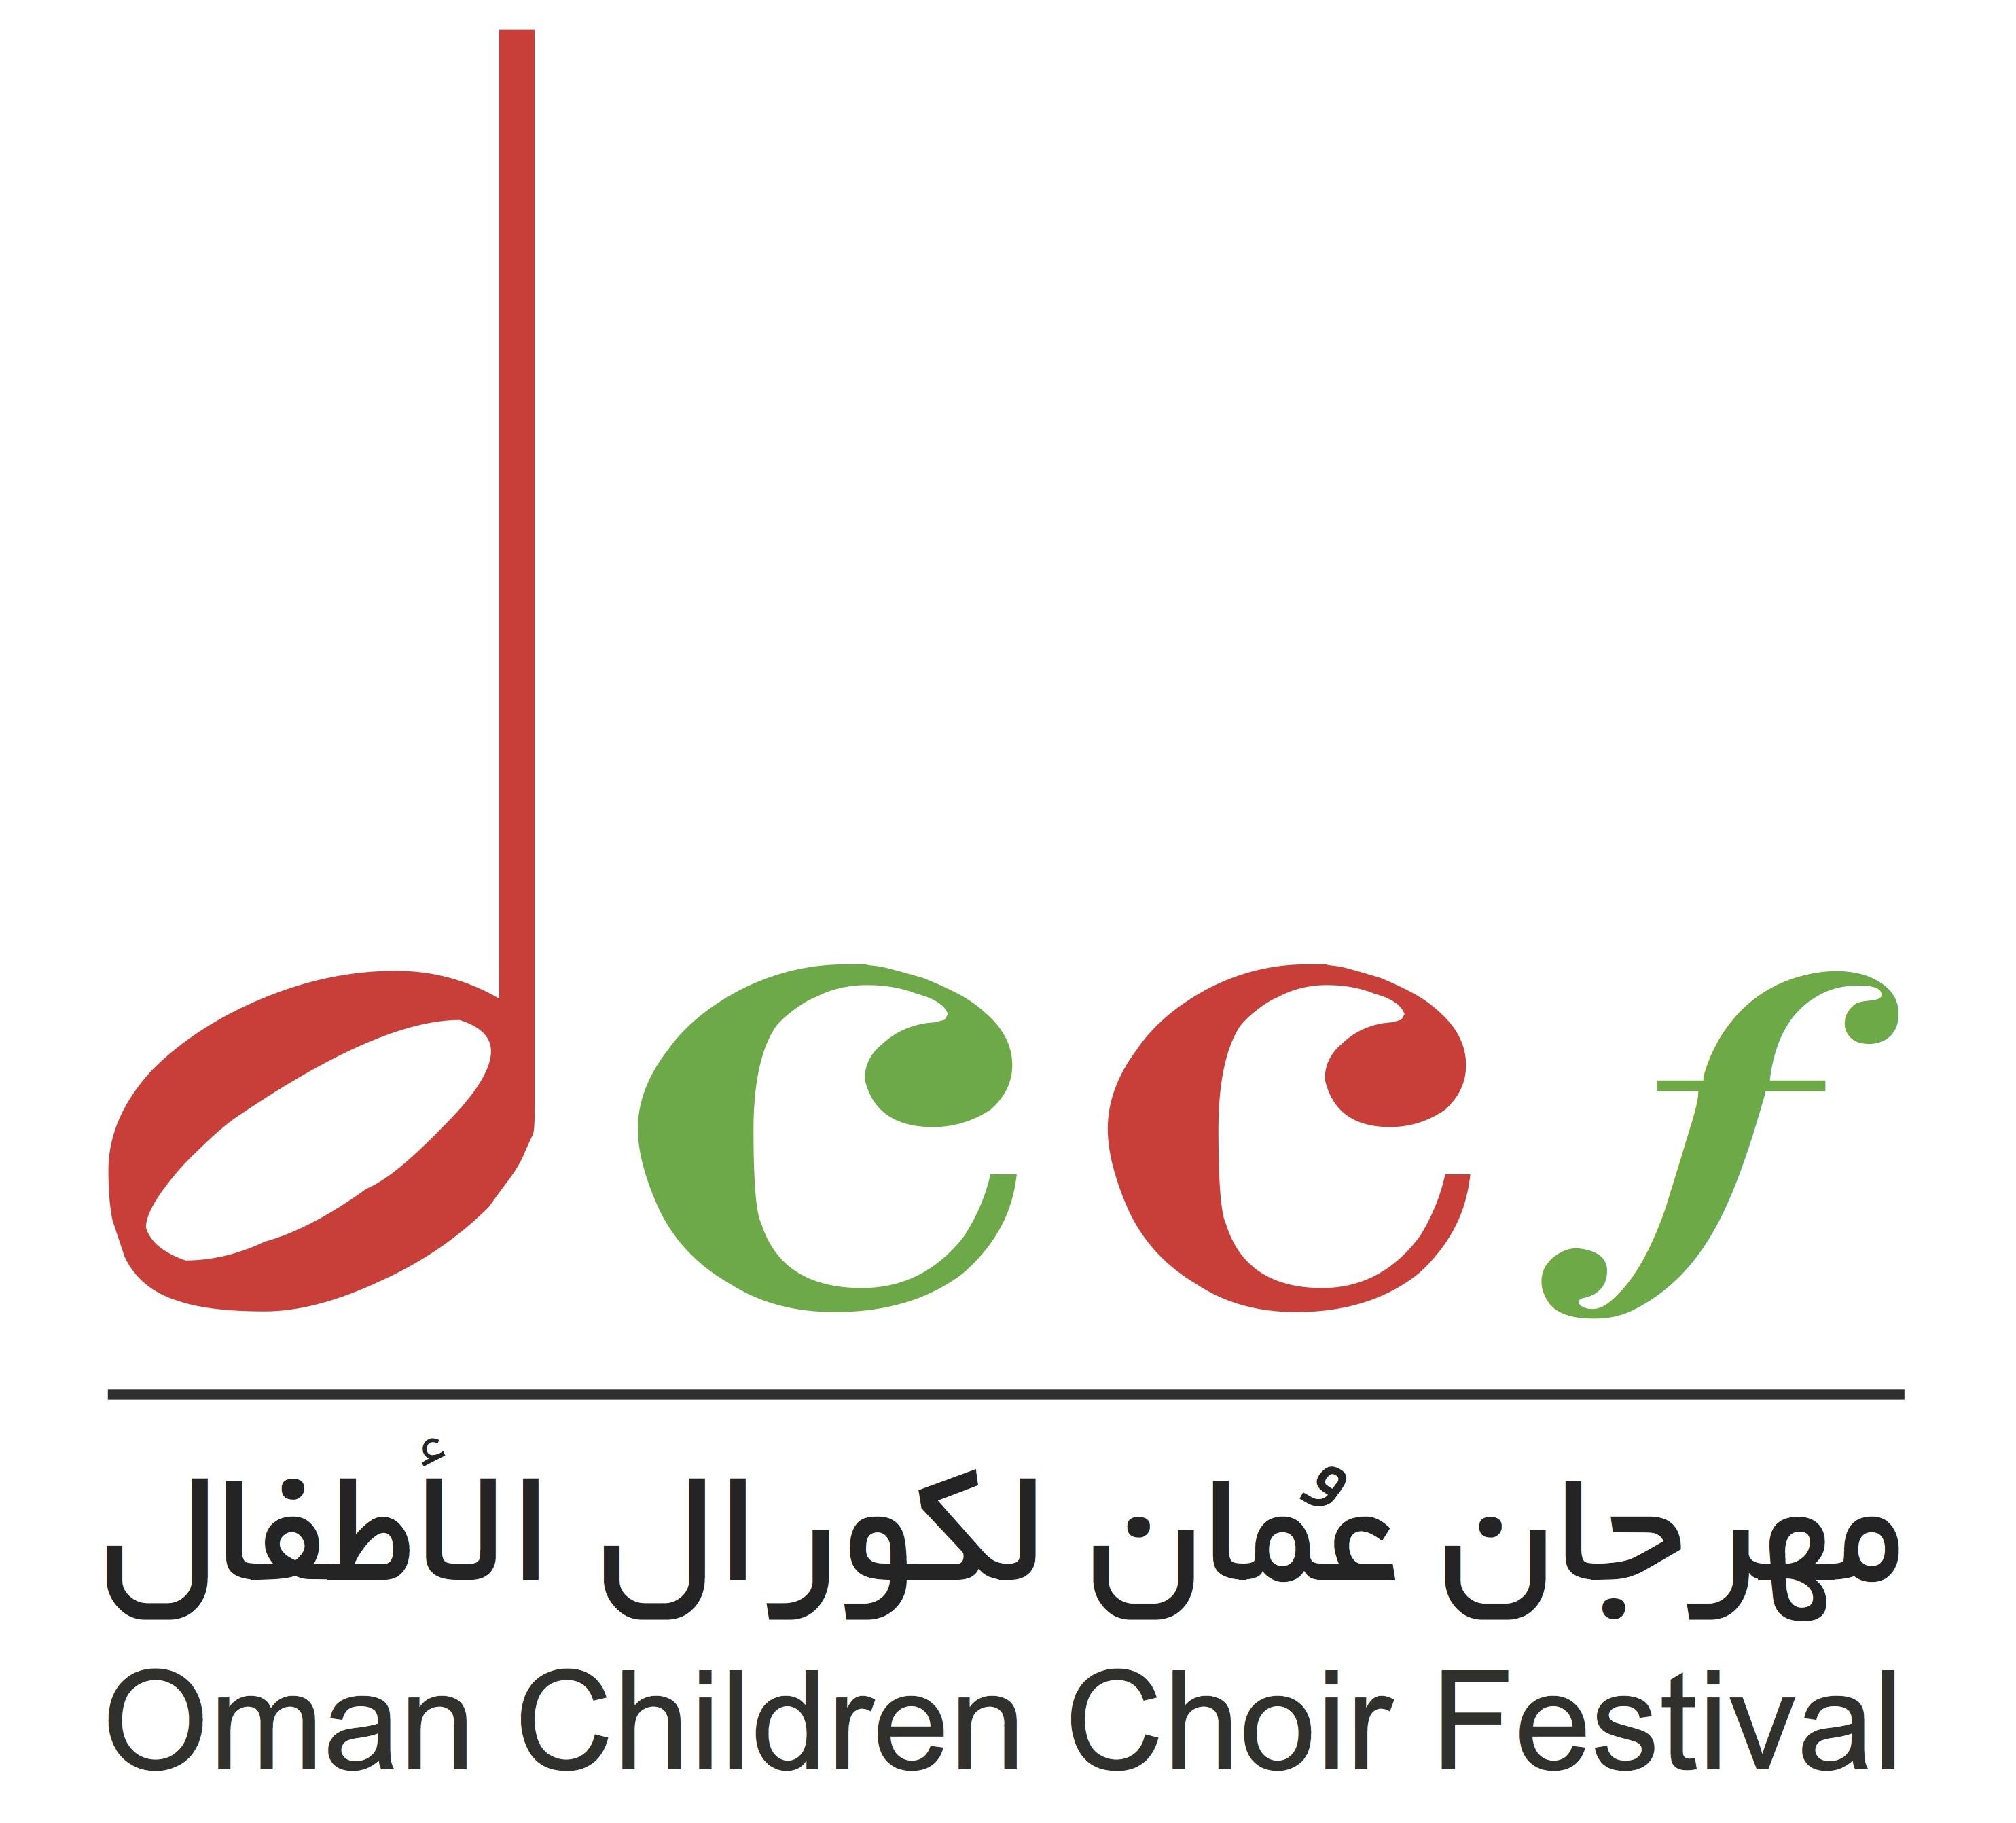 Oman Children Choir